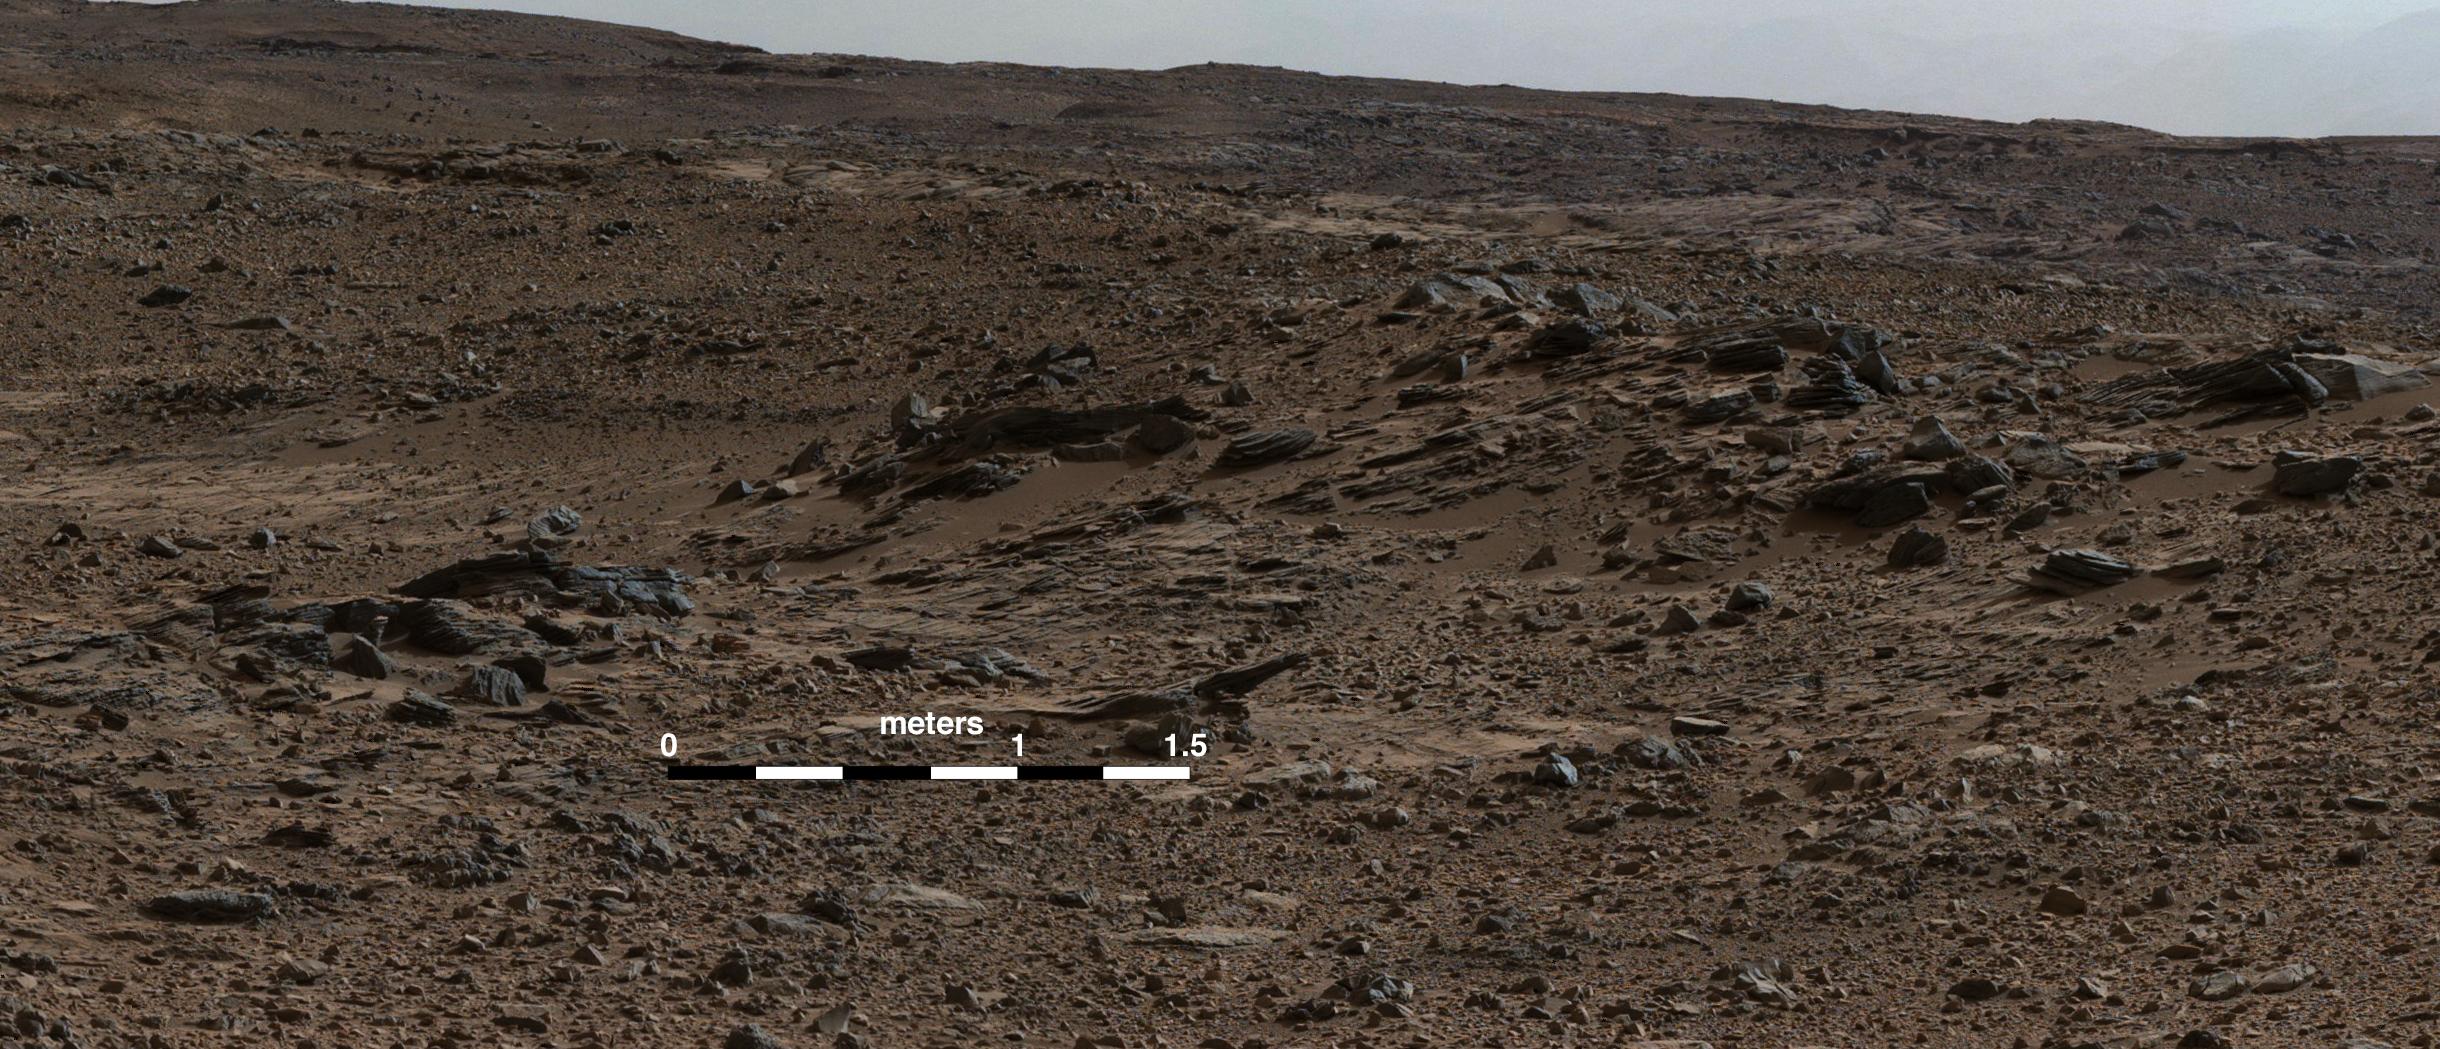 Curiosity Image Gallery | NASA